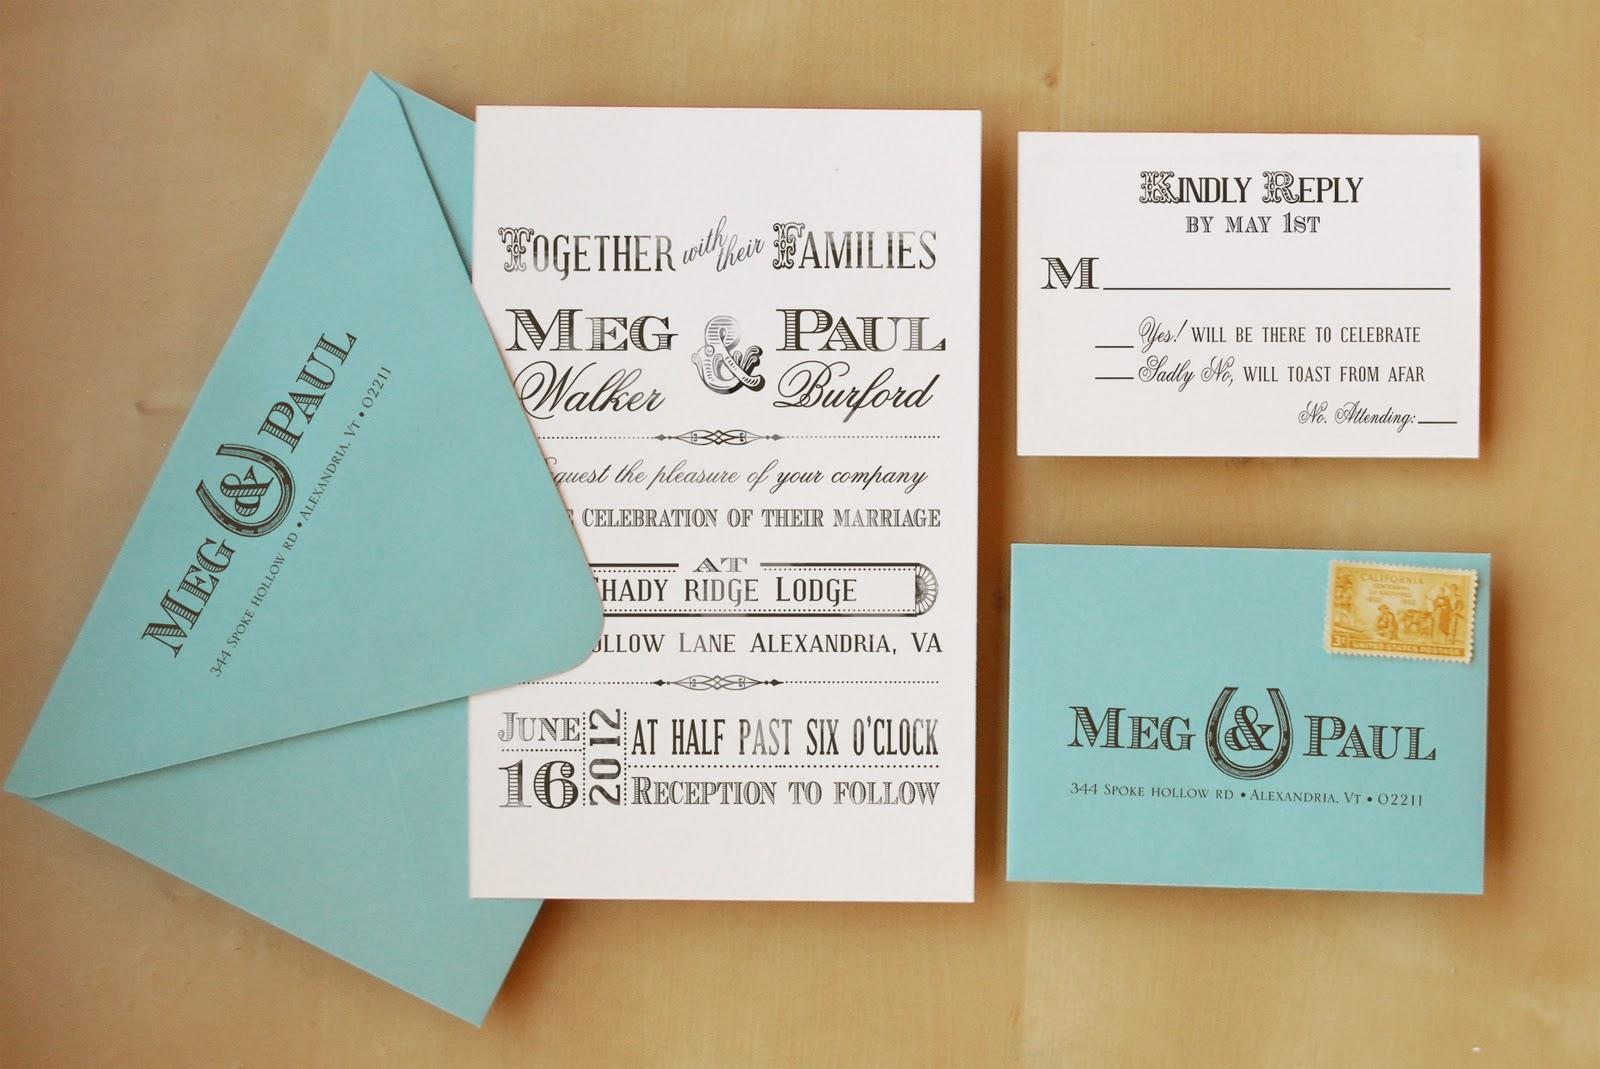 Customized Wedding Invitations: Antiquaria: Introducing Wedding Invitation Rubber Stamps